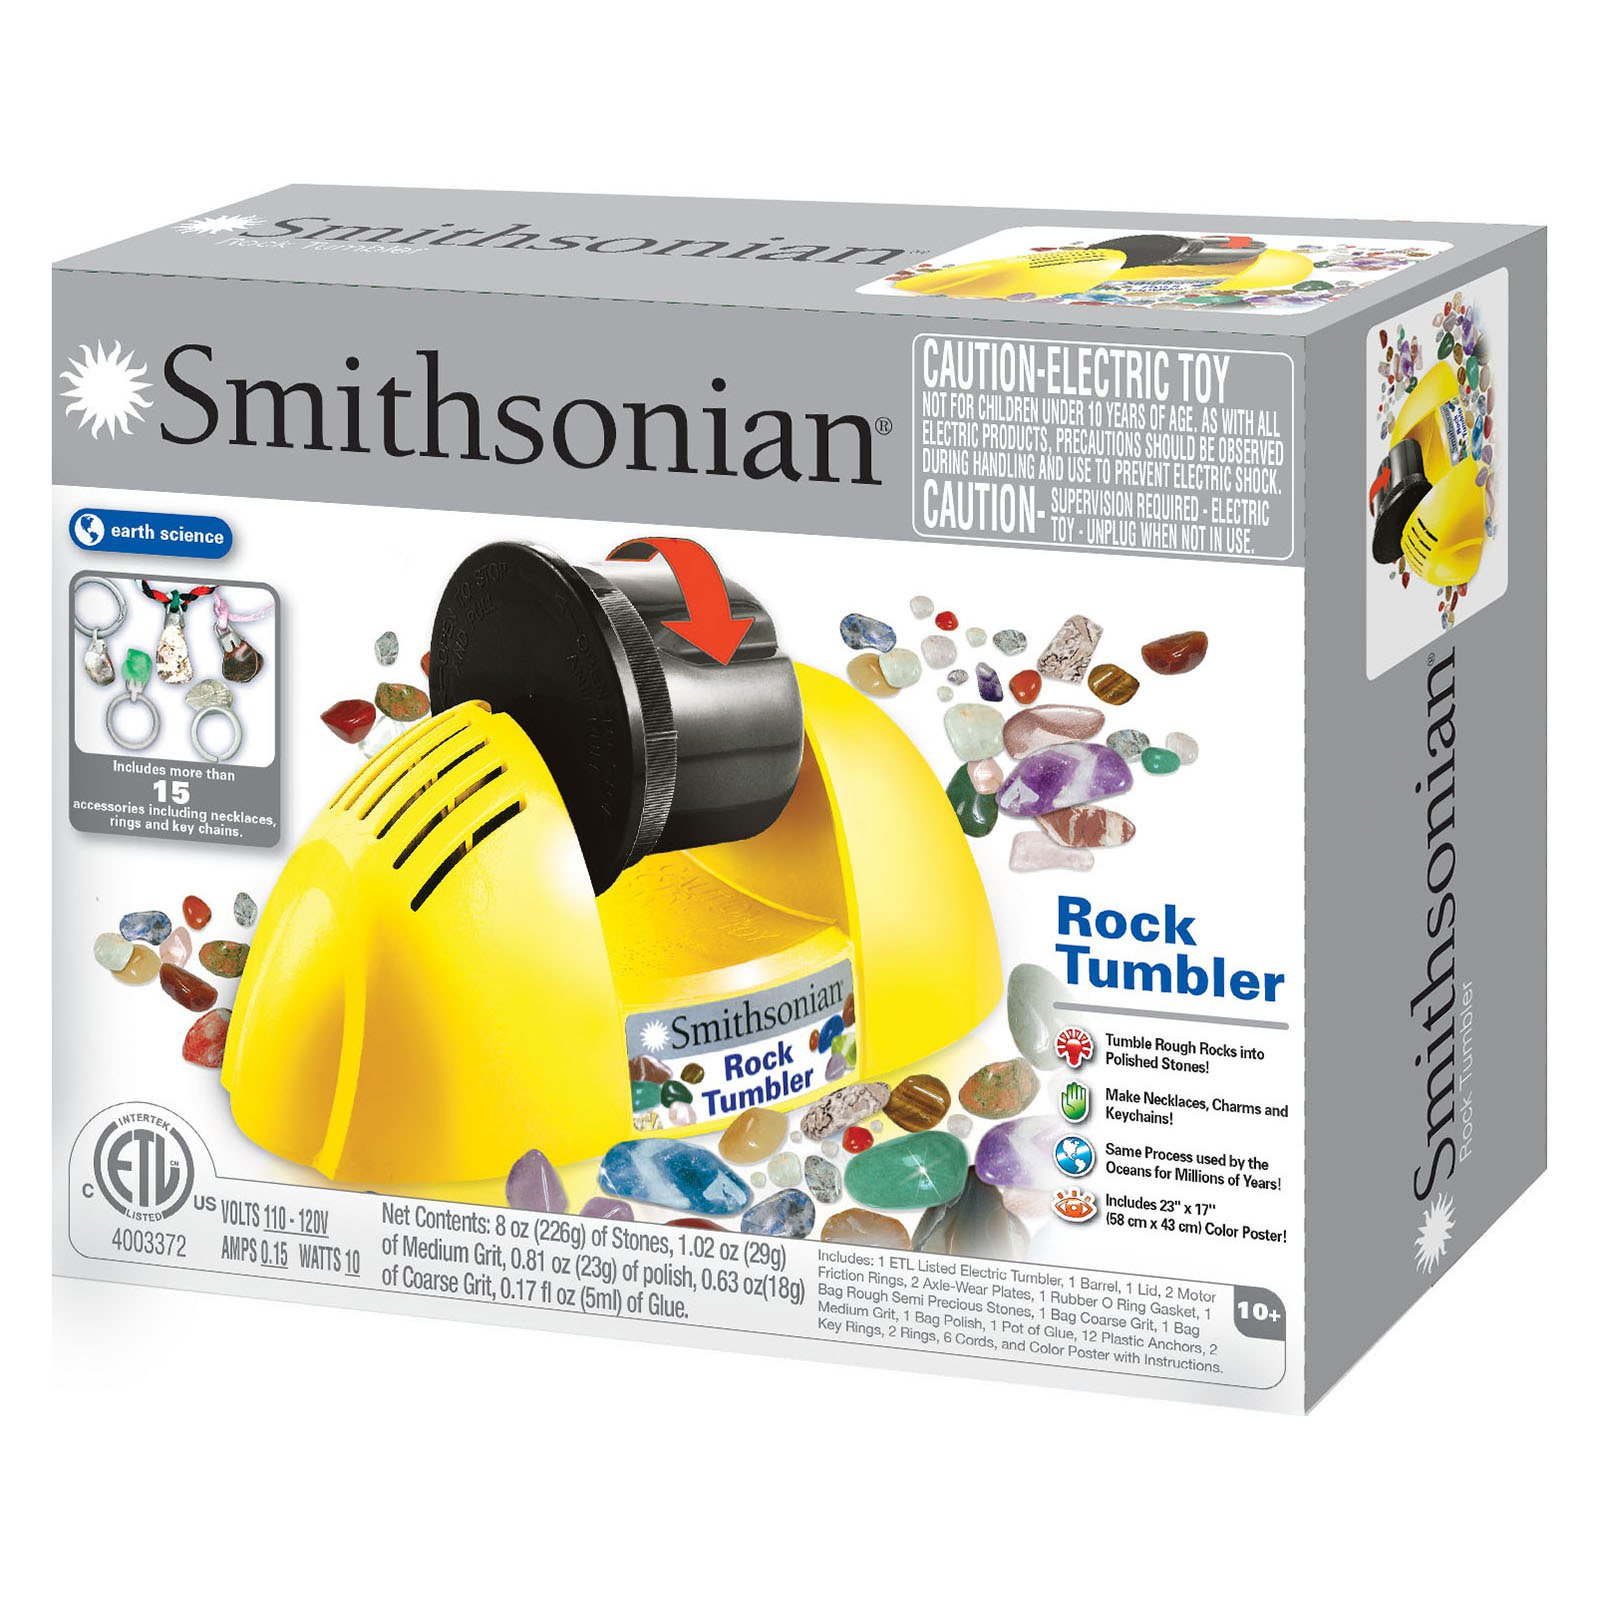 Smithsonian Rock Tumbler 1 Each Walmart